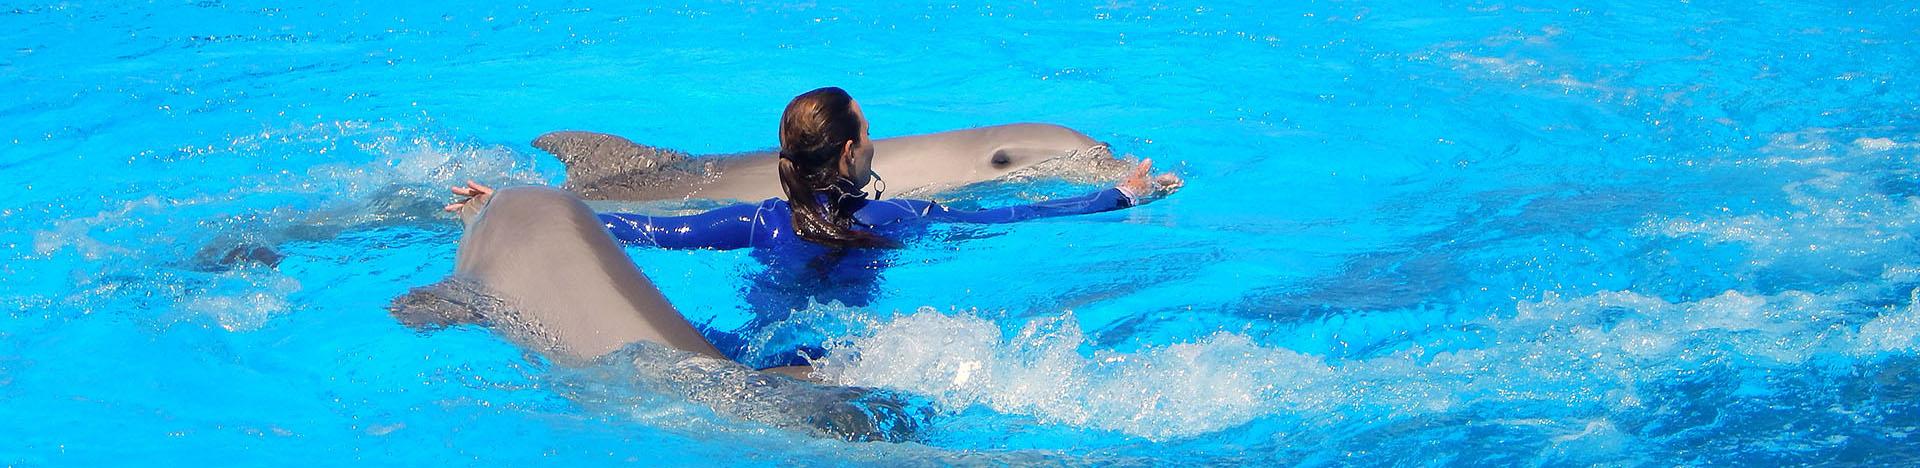 Marine Park Malta Dolphins